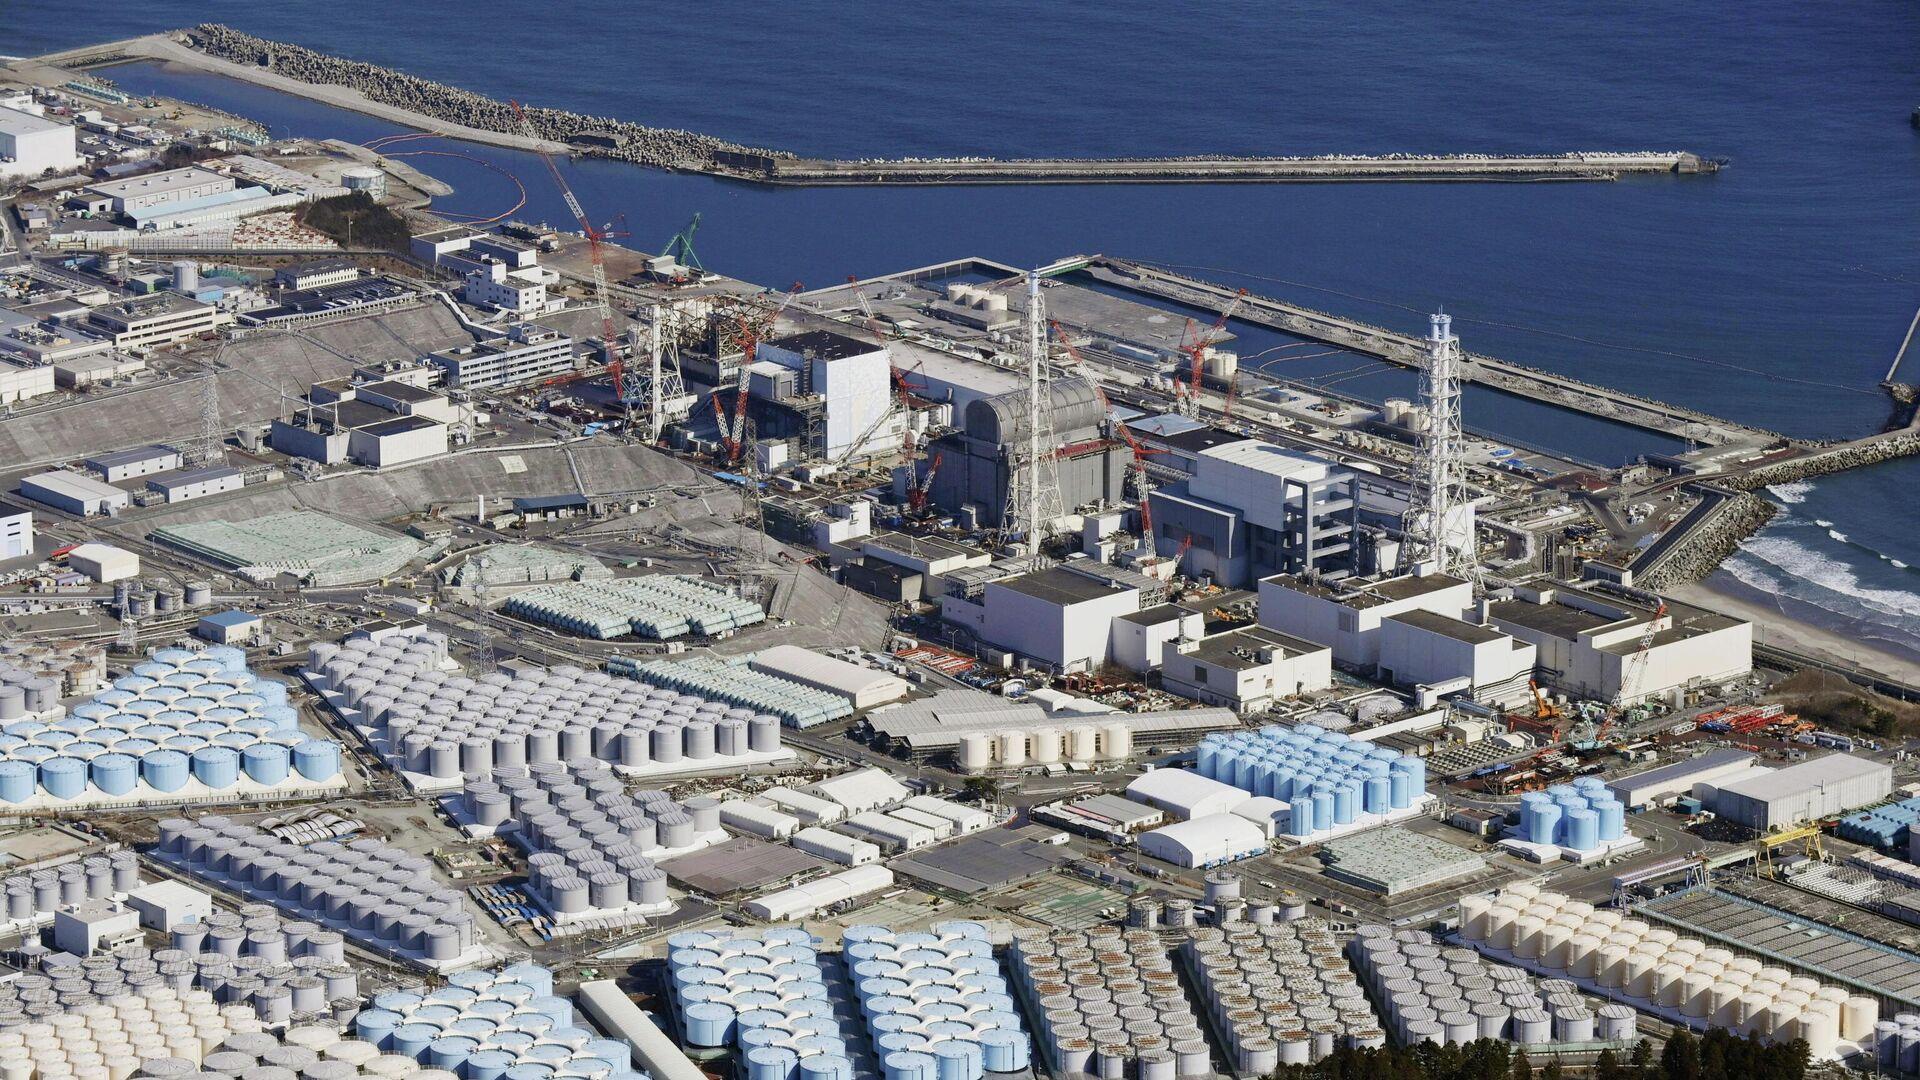 La central nuclear de Fukushima Daiichi - Sputnik Mundo, 1920, 13.04.2021